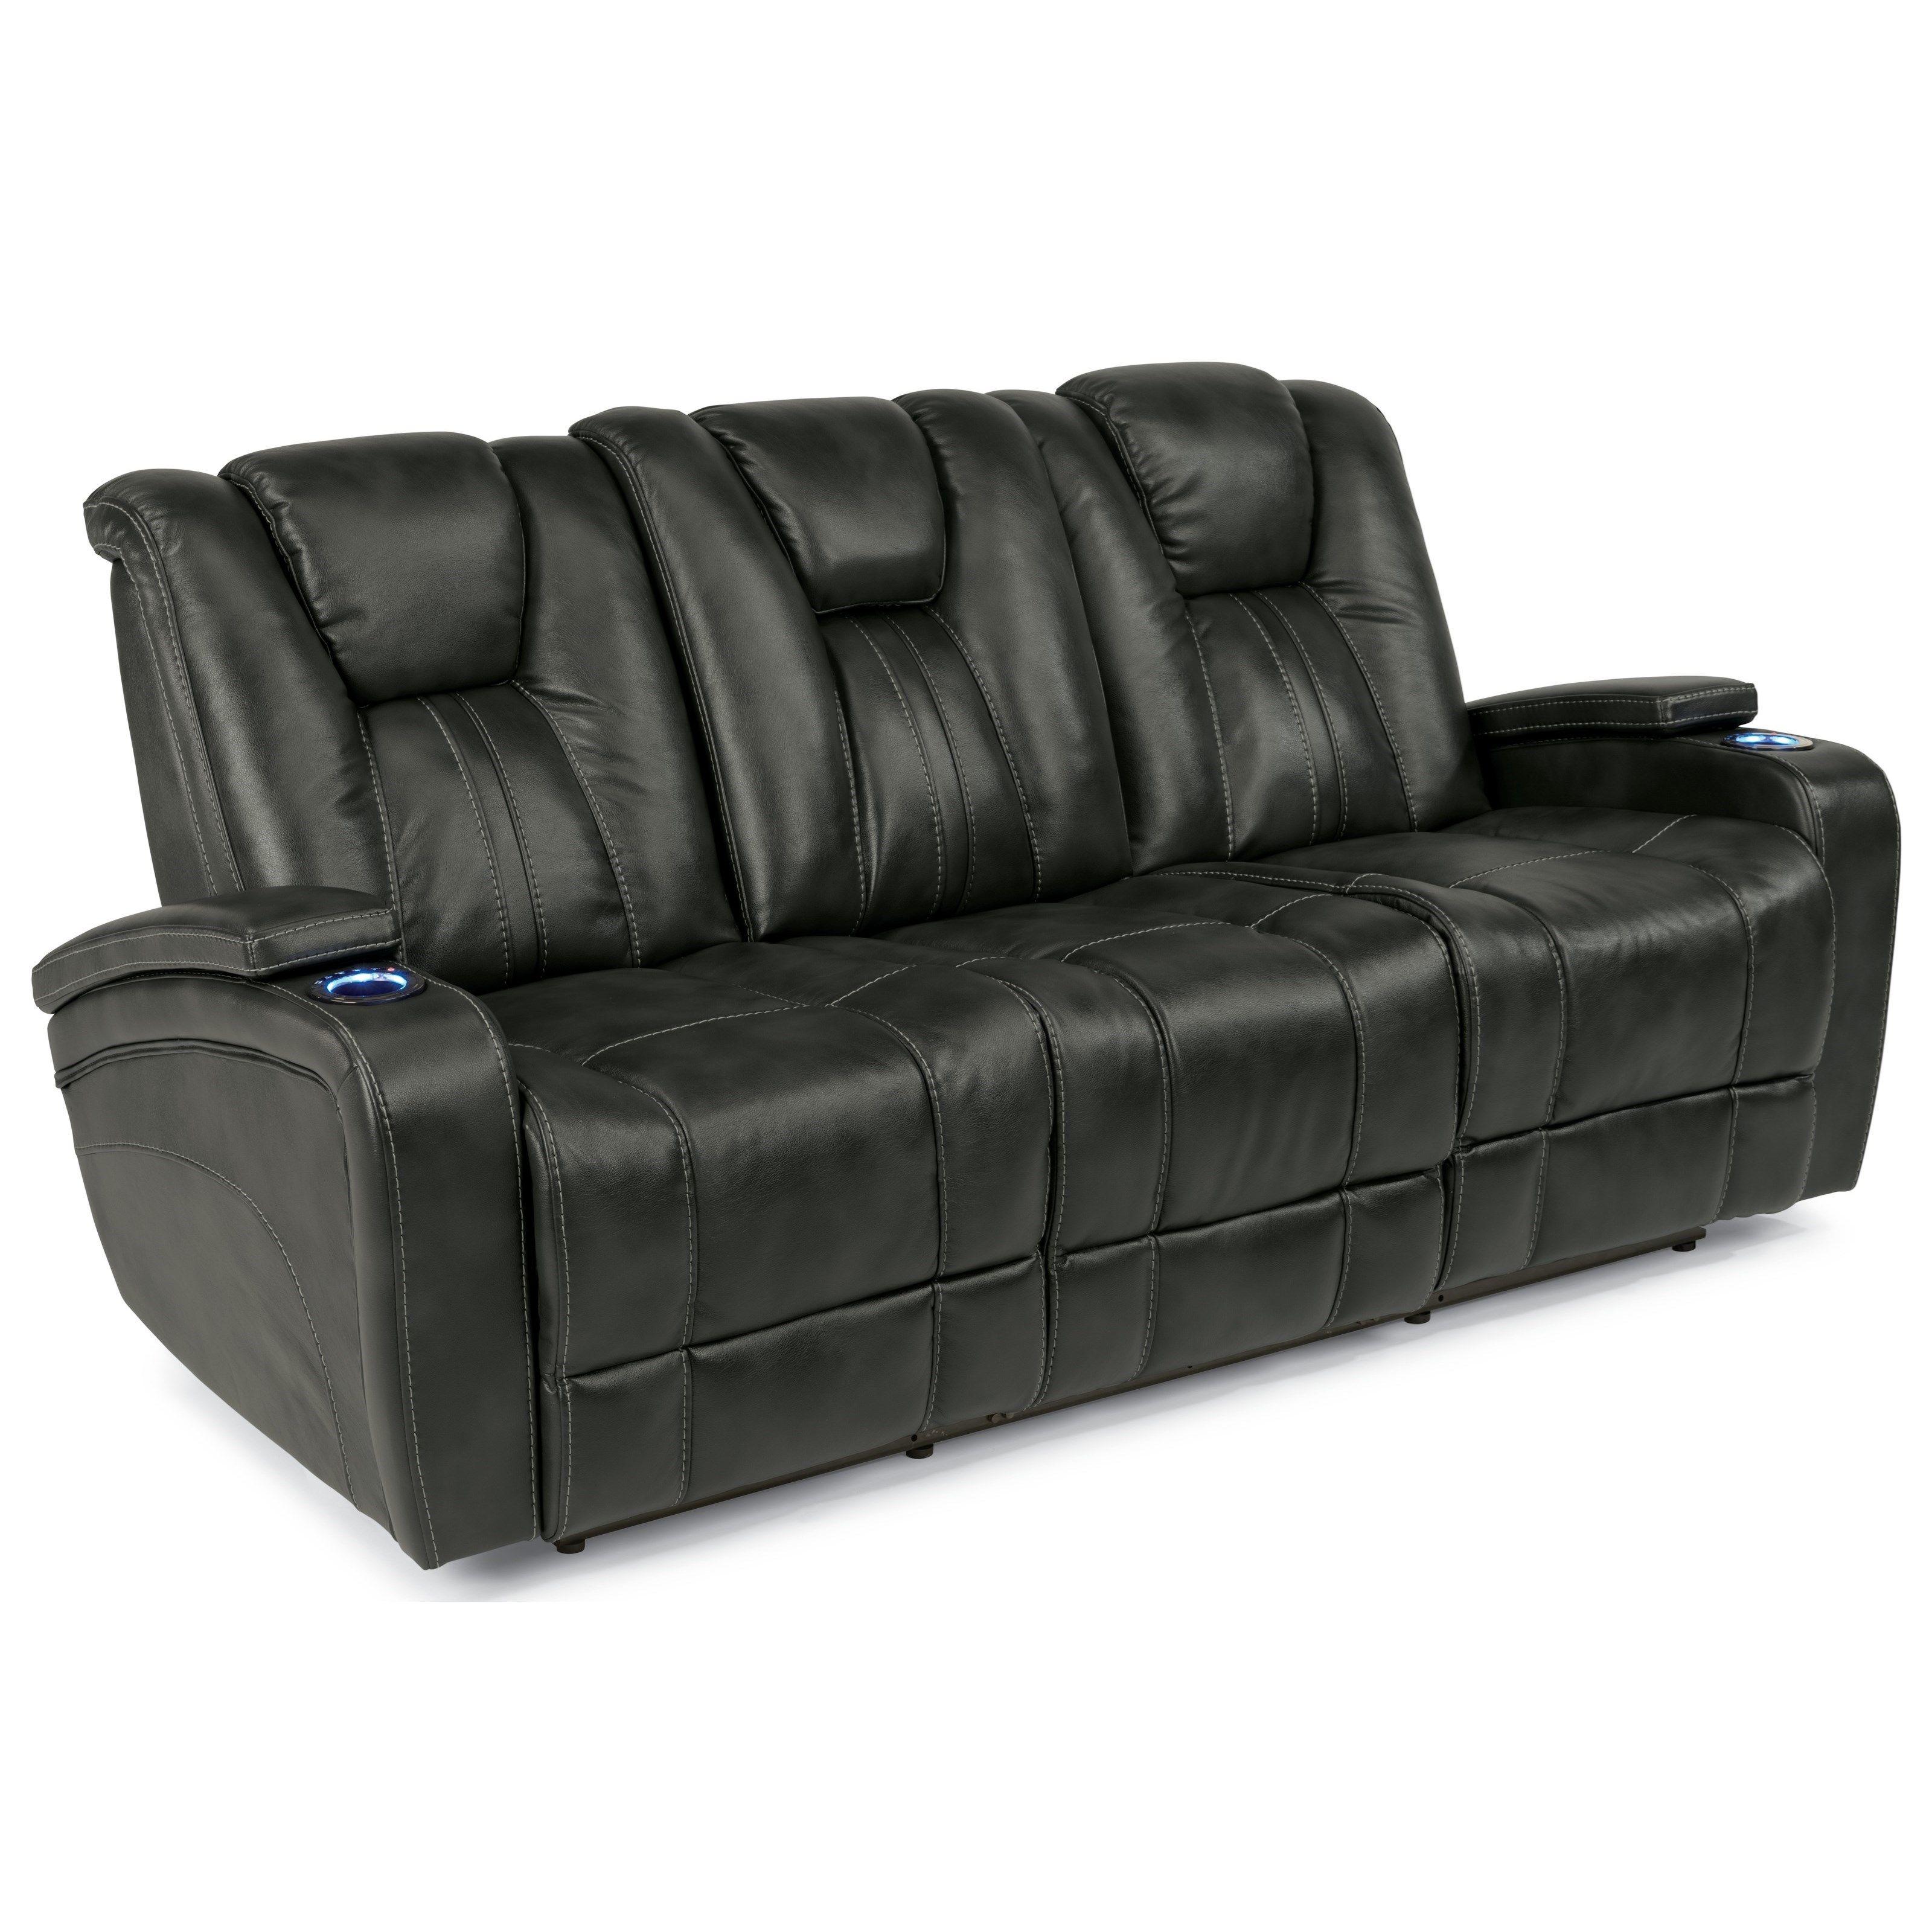 LatitudesTrinidad Power Reclining Sofa by Flexsteel